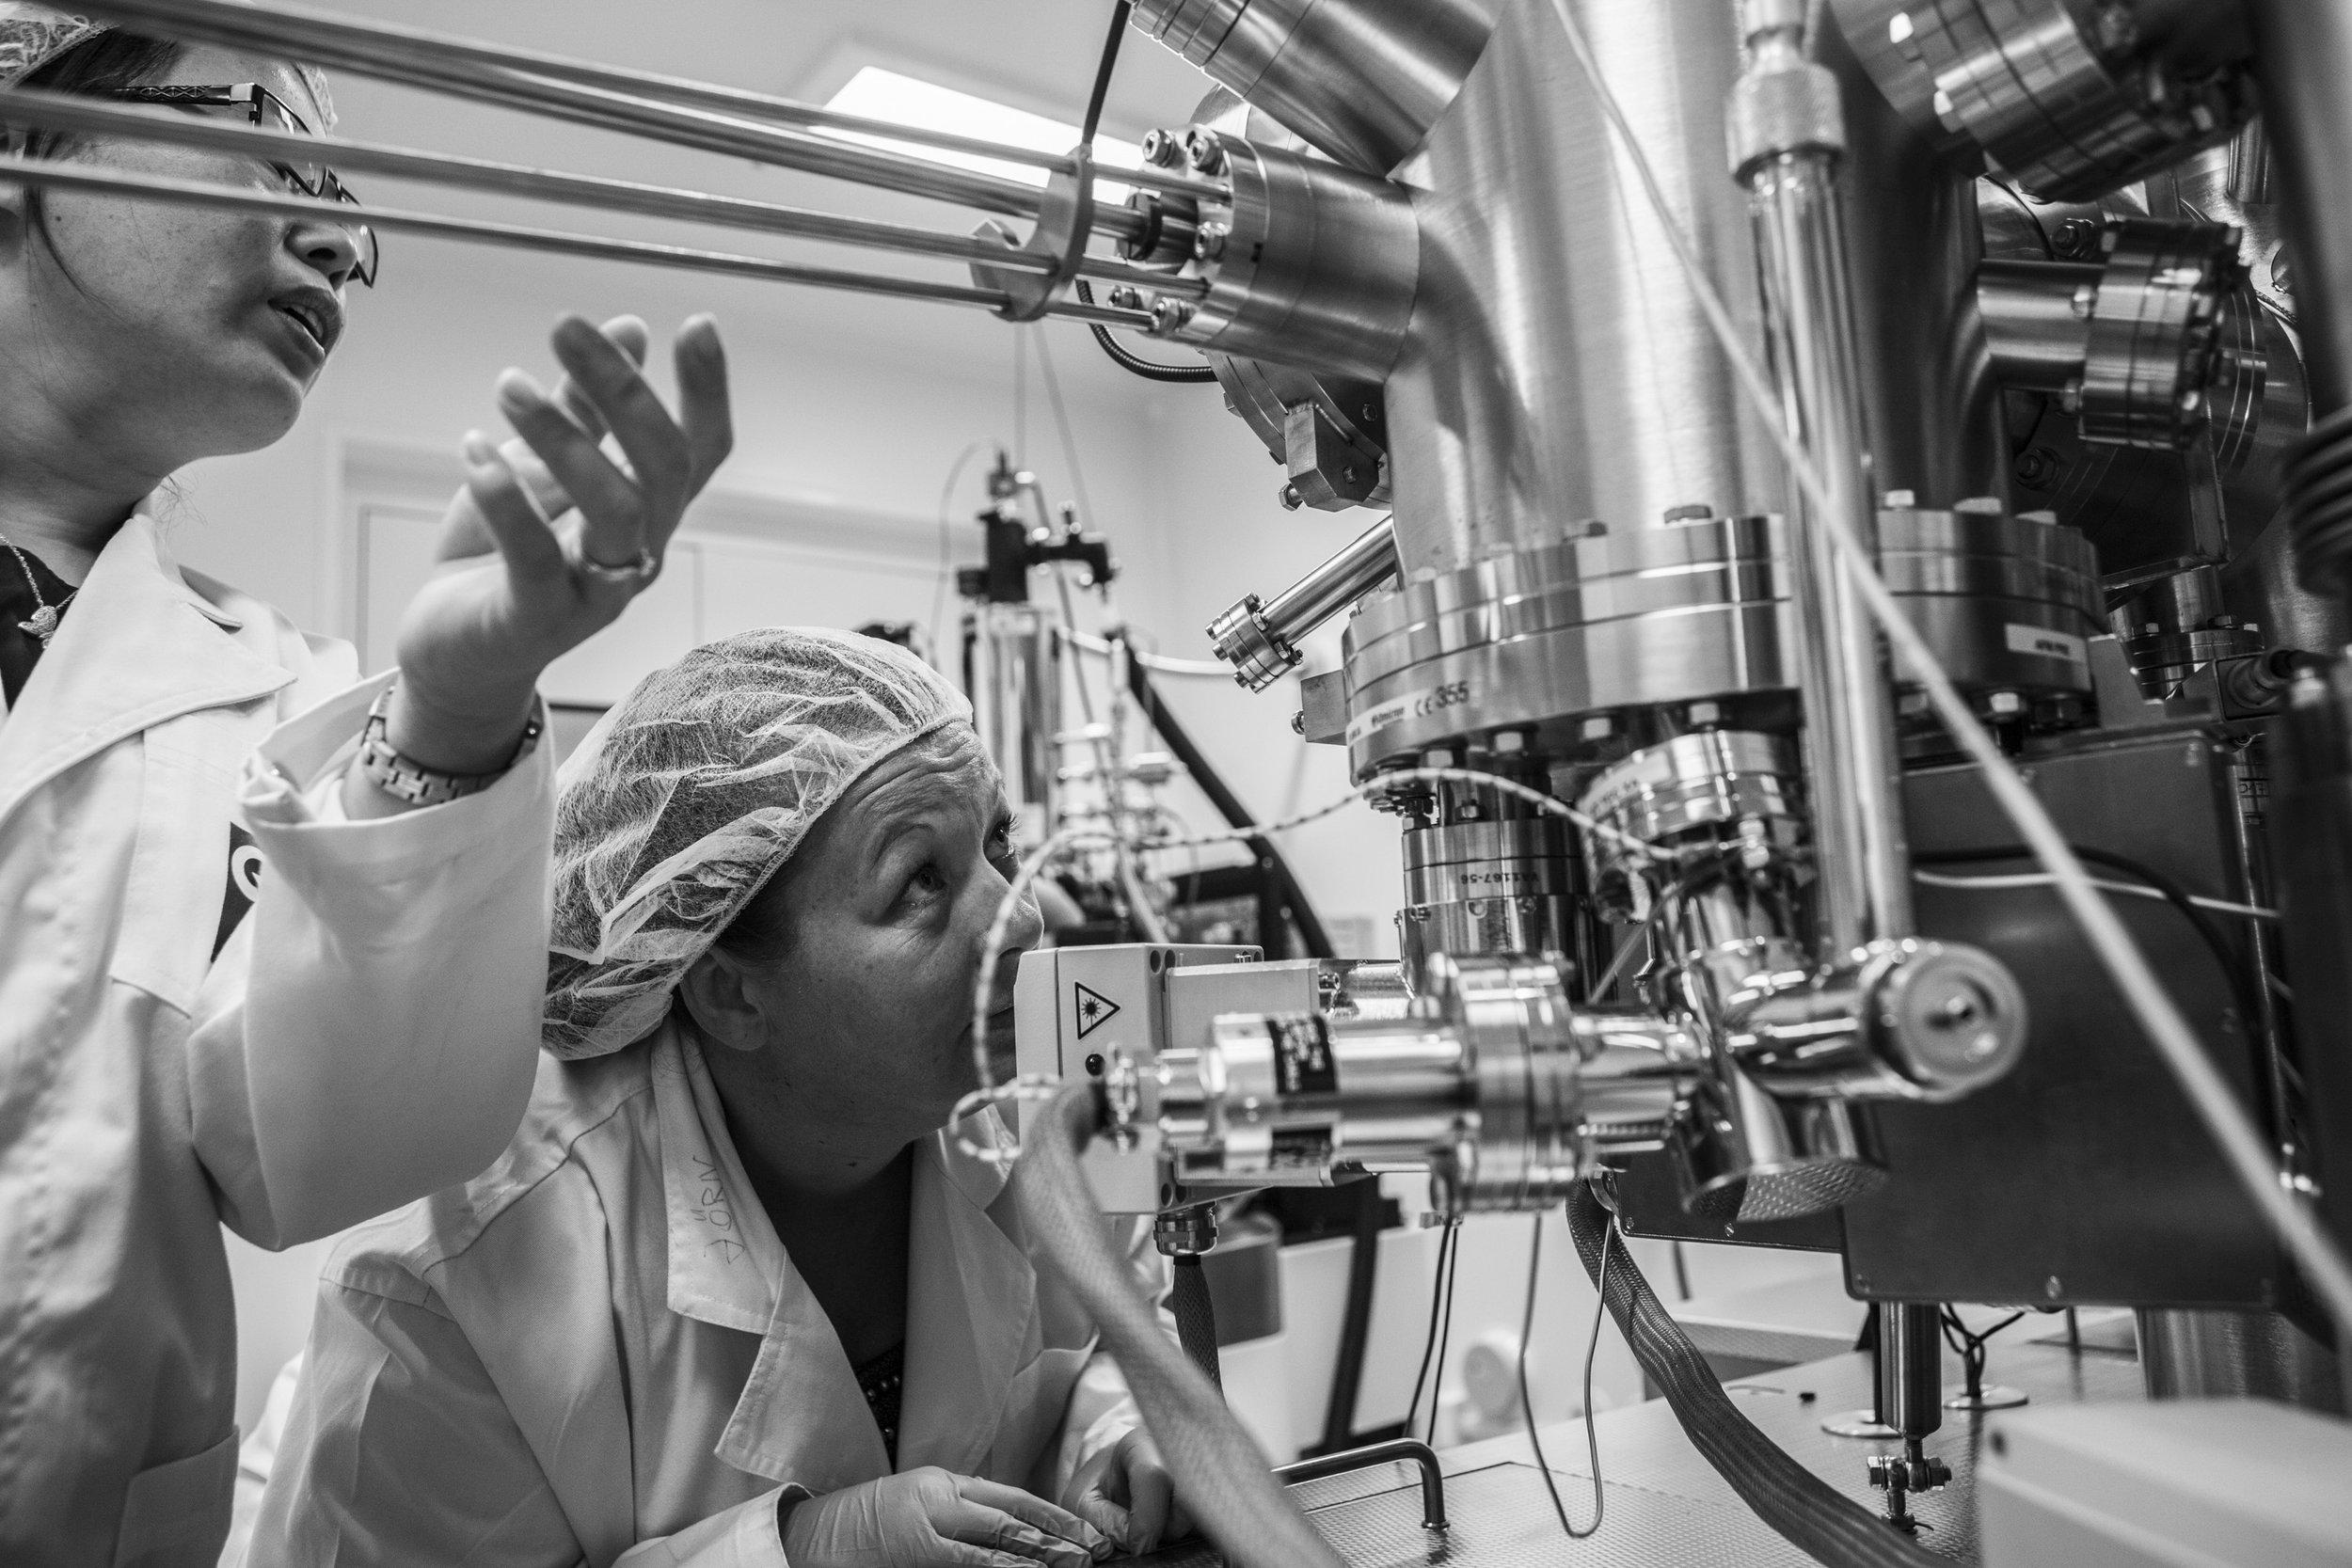 QUT Science & Engineering Centre, Brisbane, Queensland. Australia. UHV (Ultra High Vacuum) SPM (Scanning Probe Microscope). © Russell Shakespeare/The Magnum Foundation 2018